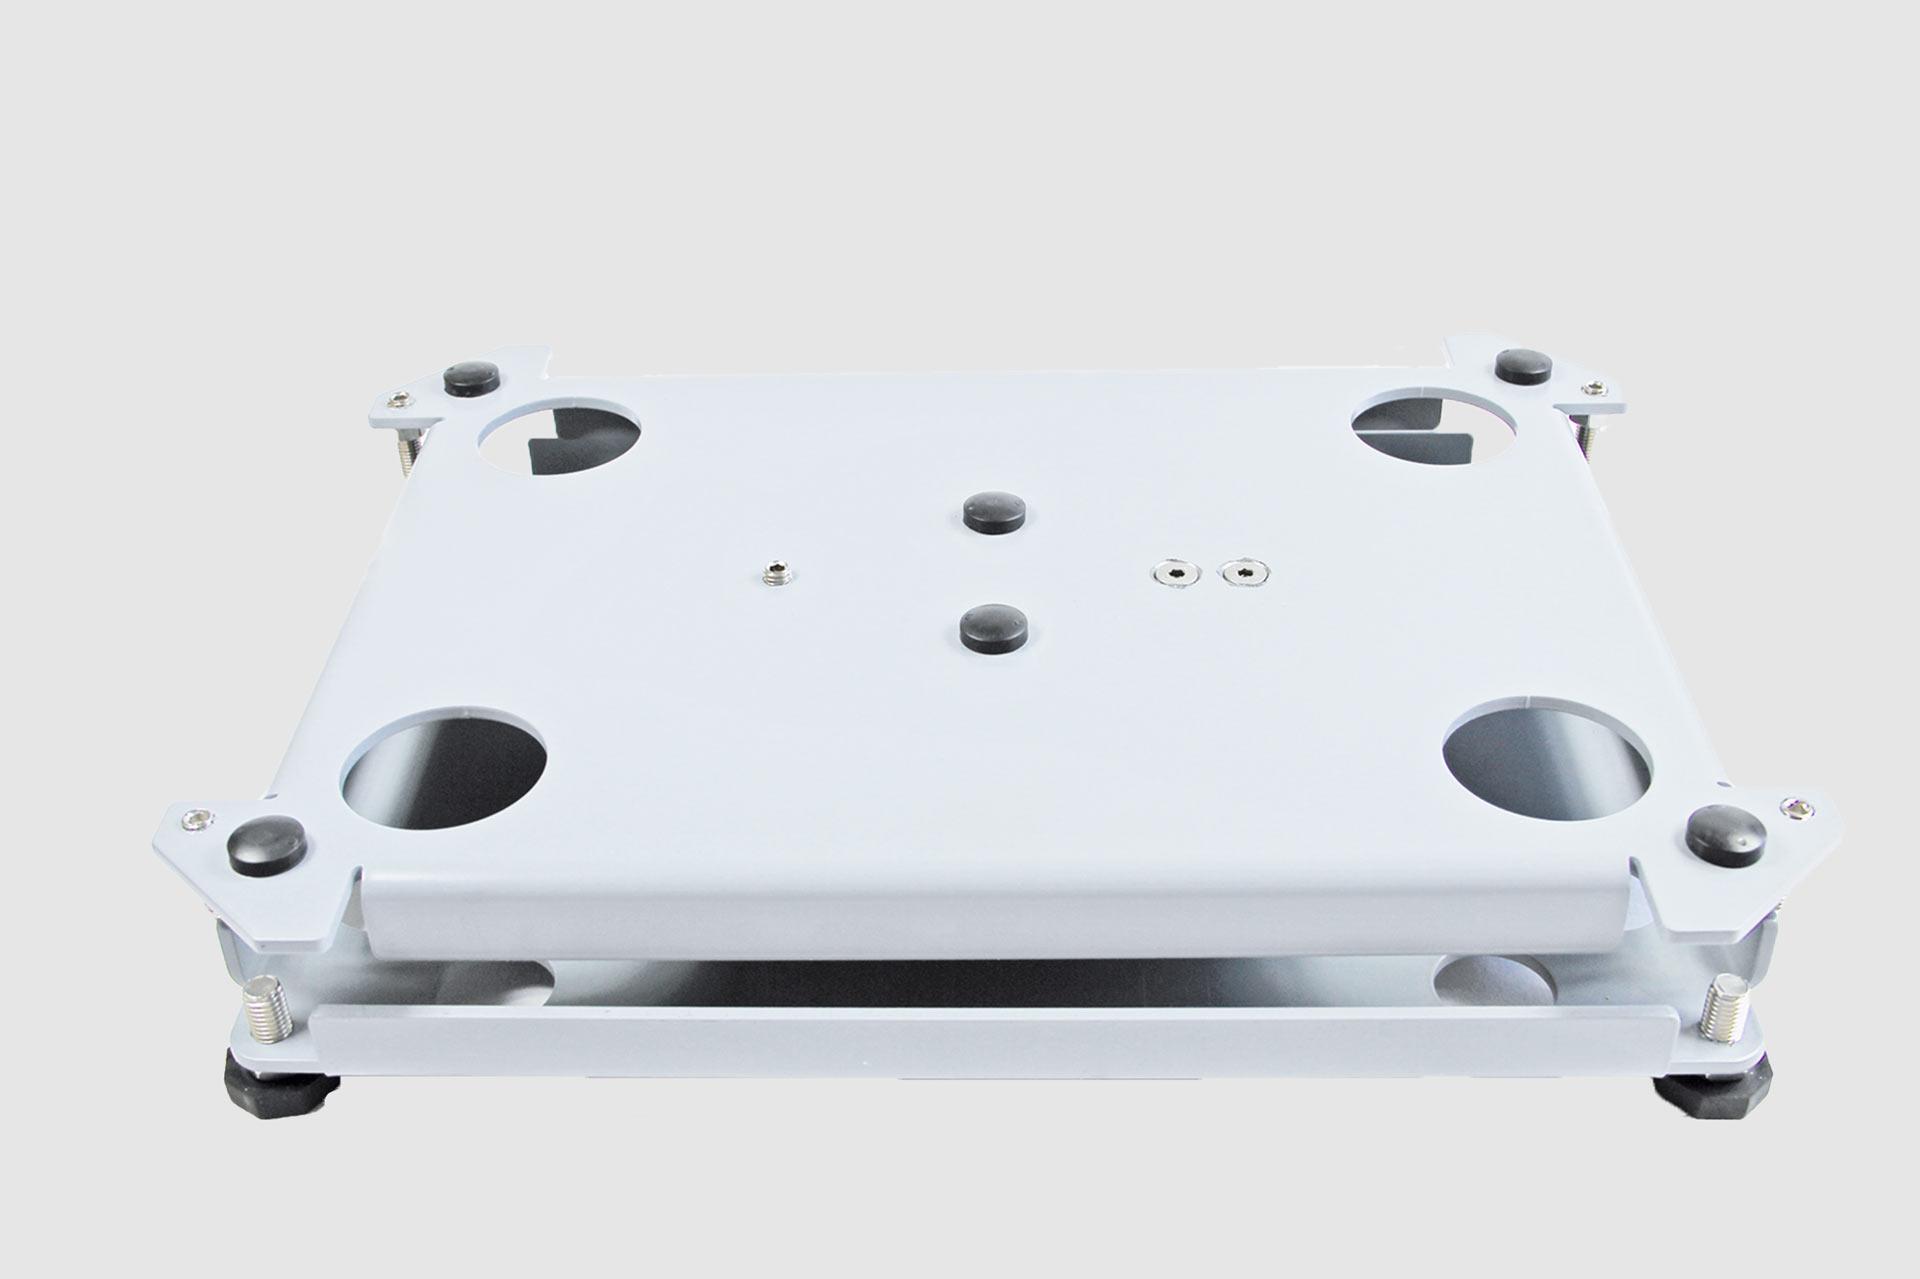 Edelstahl-Plattformwaage - flache Bauweise